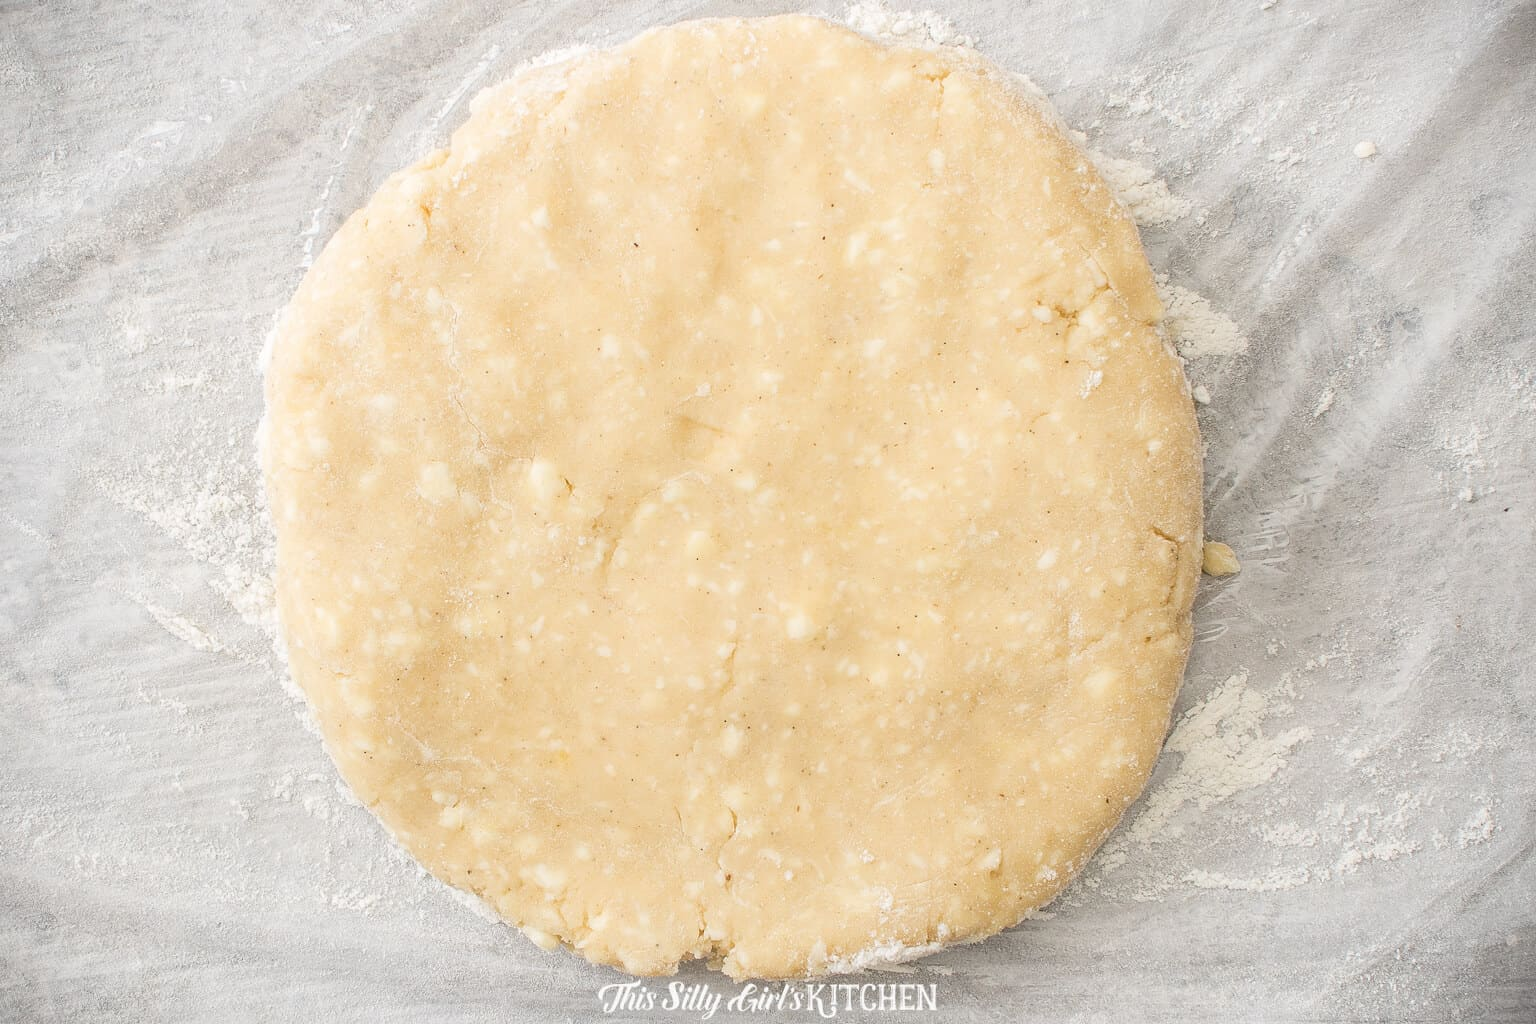 Pie crust on disc shape